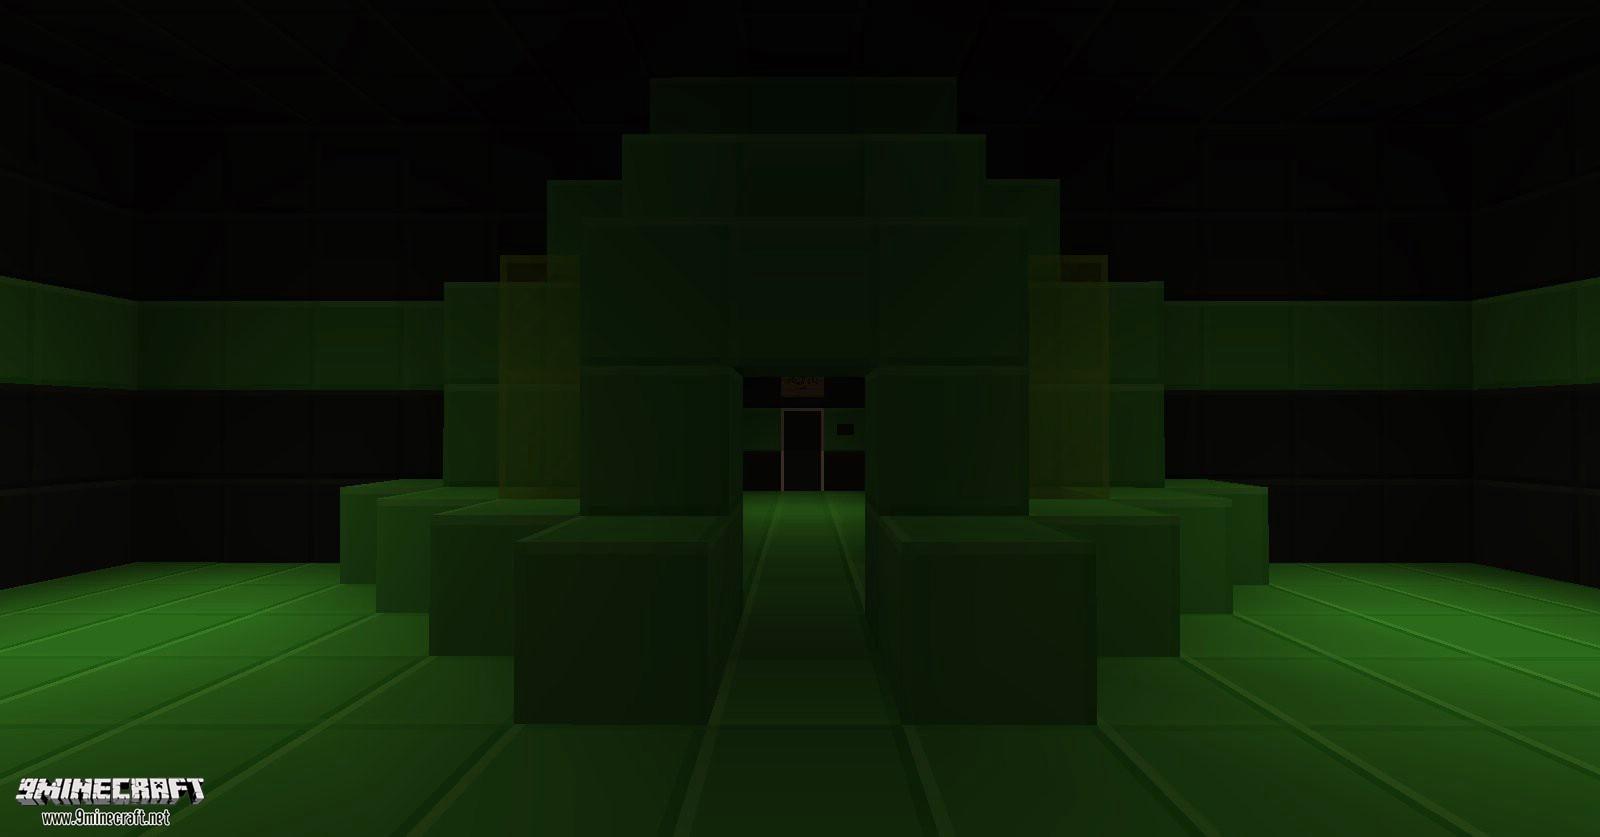 Laser-tag-capture-the-blocks-map-2.jpg